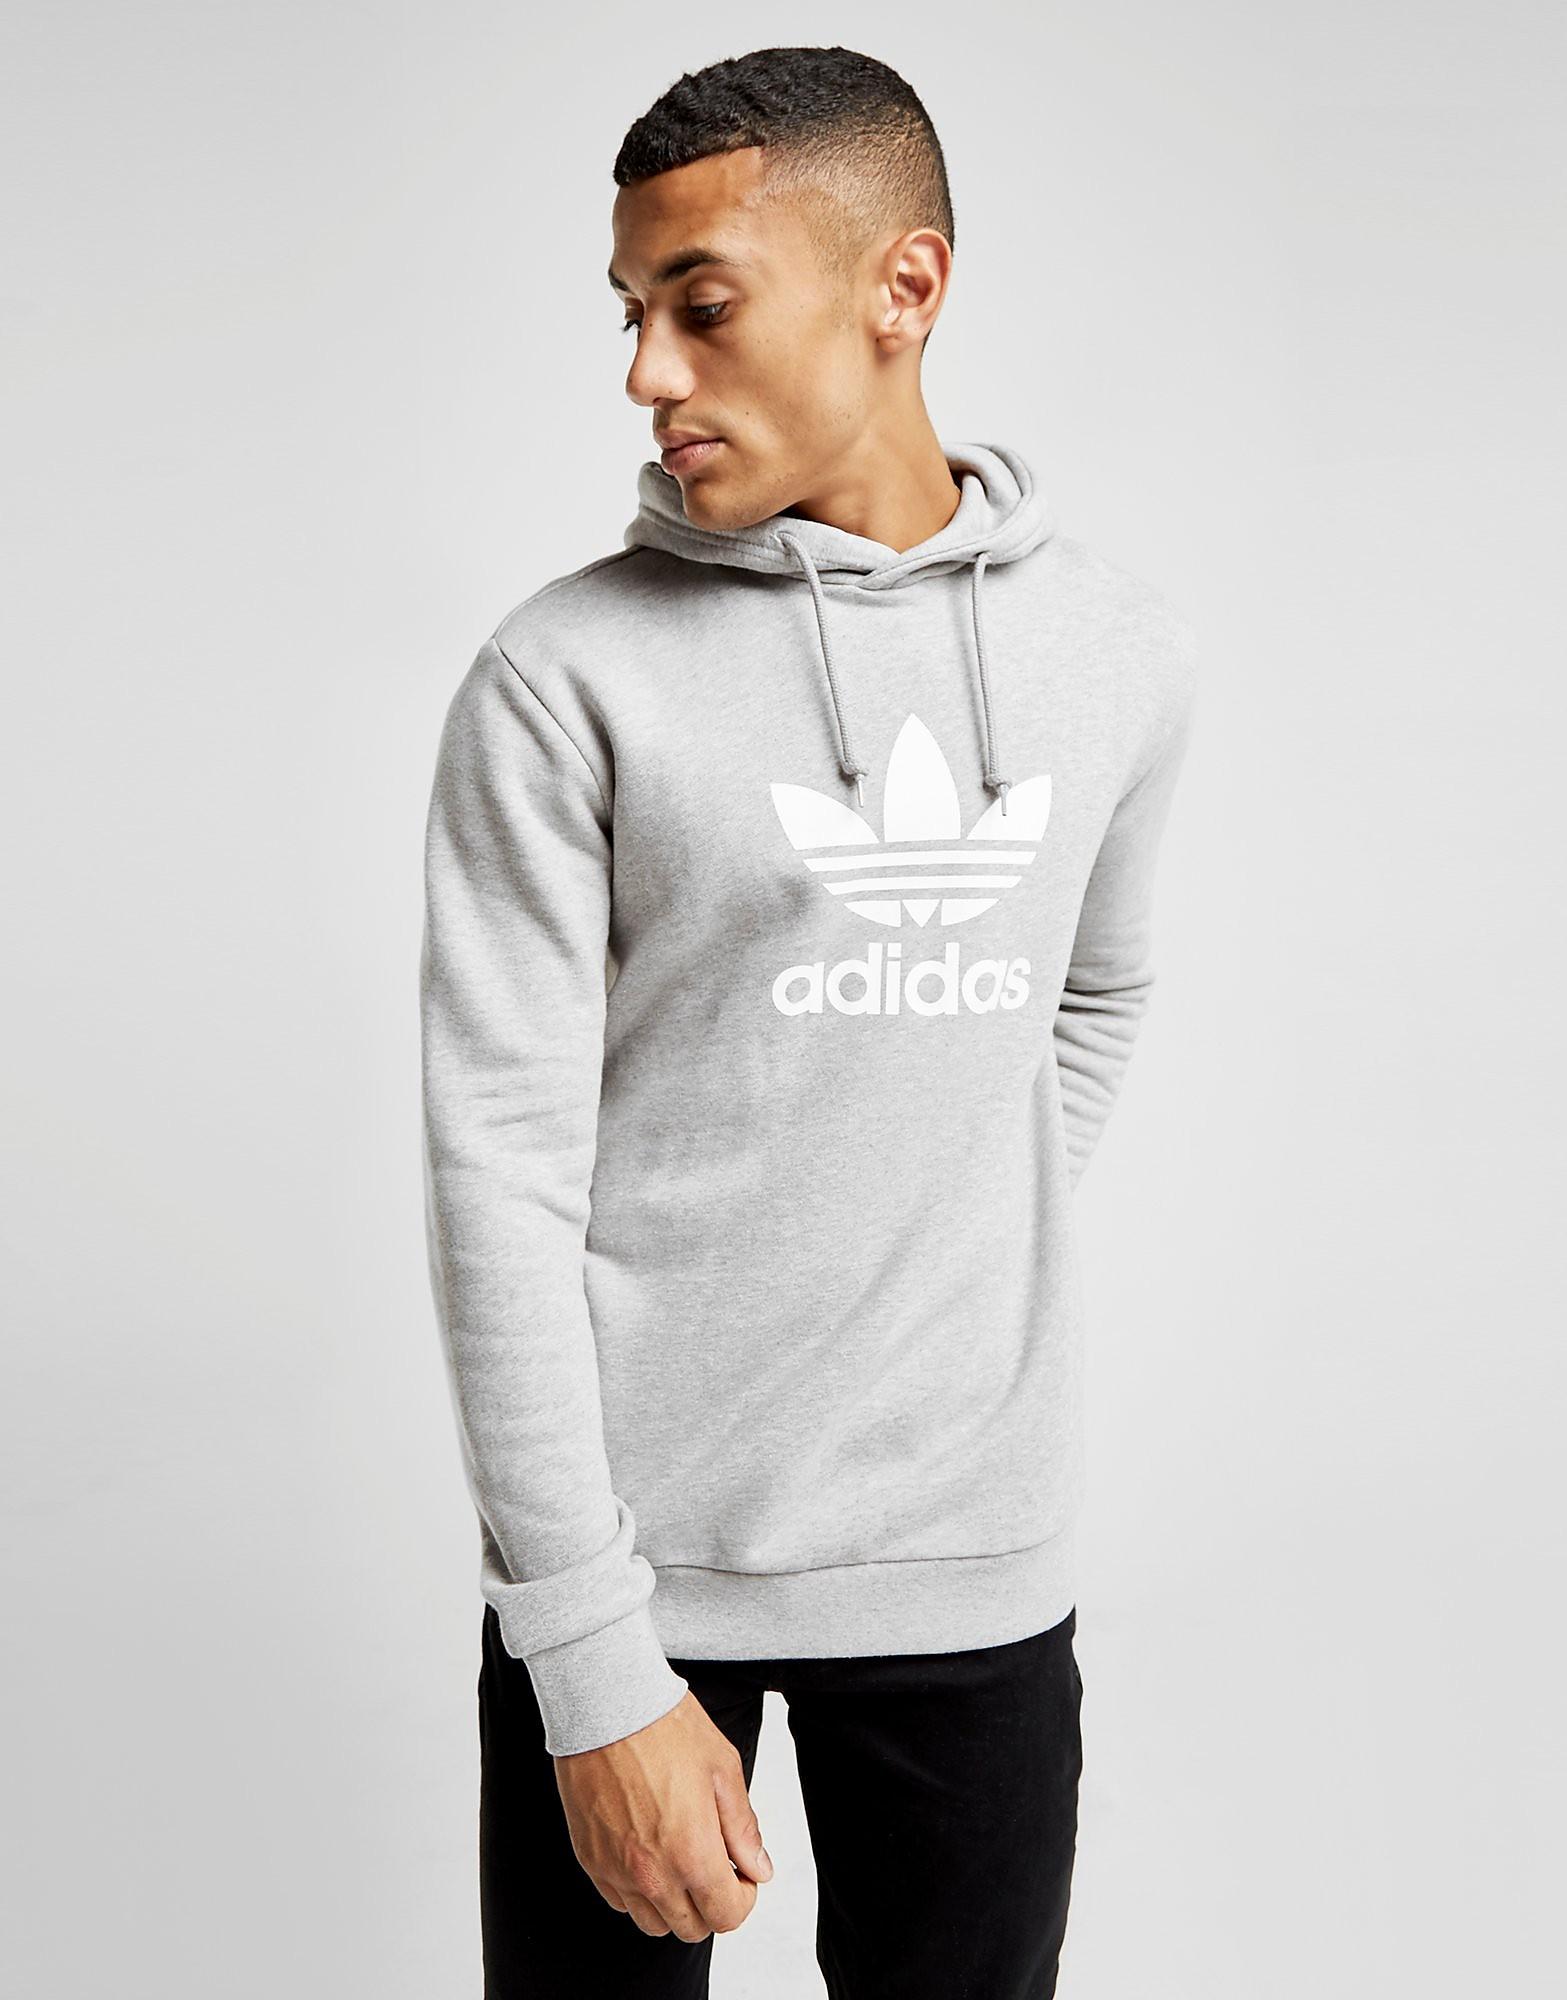 adidas Originals Trefoil State Overhead Hoodie - Grau - Mens, Grau